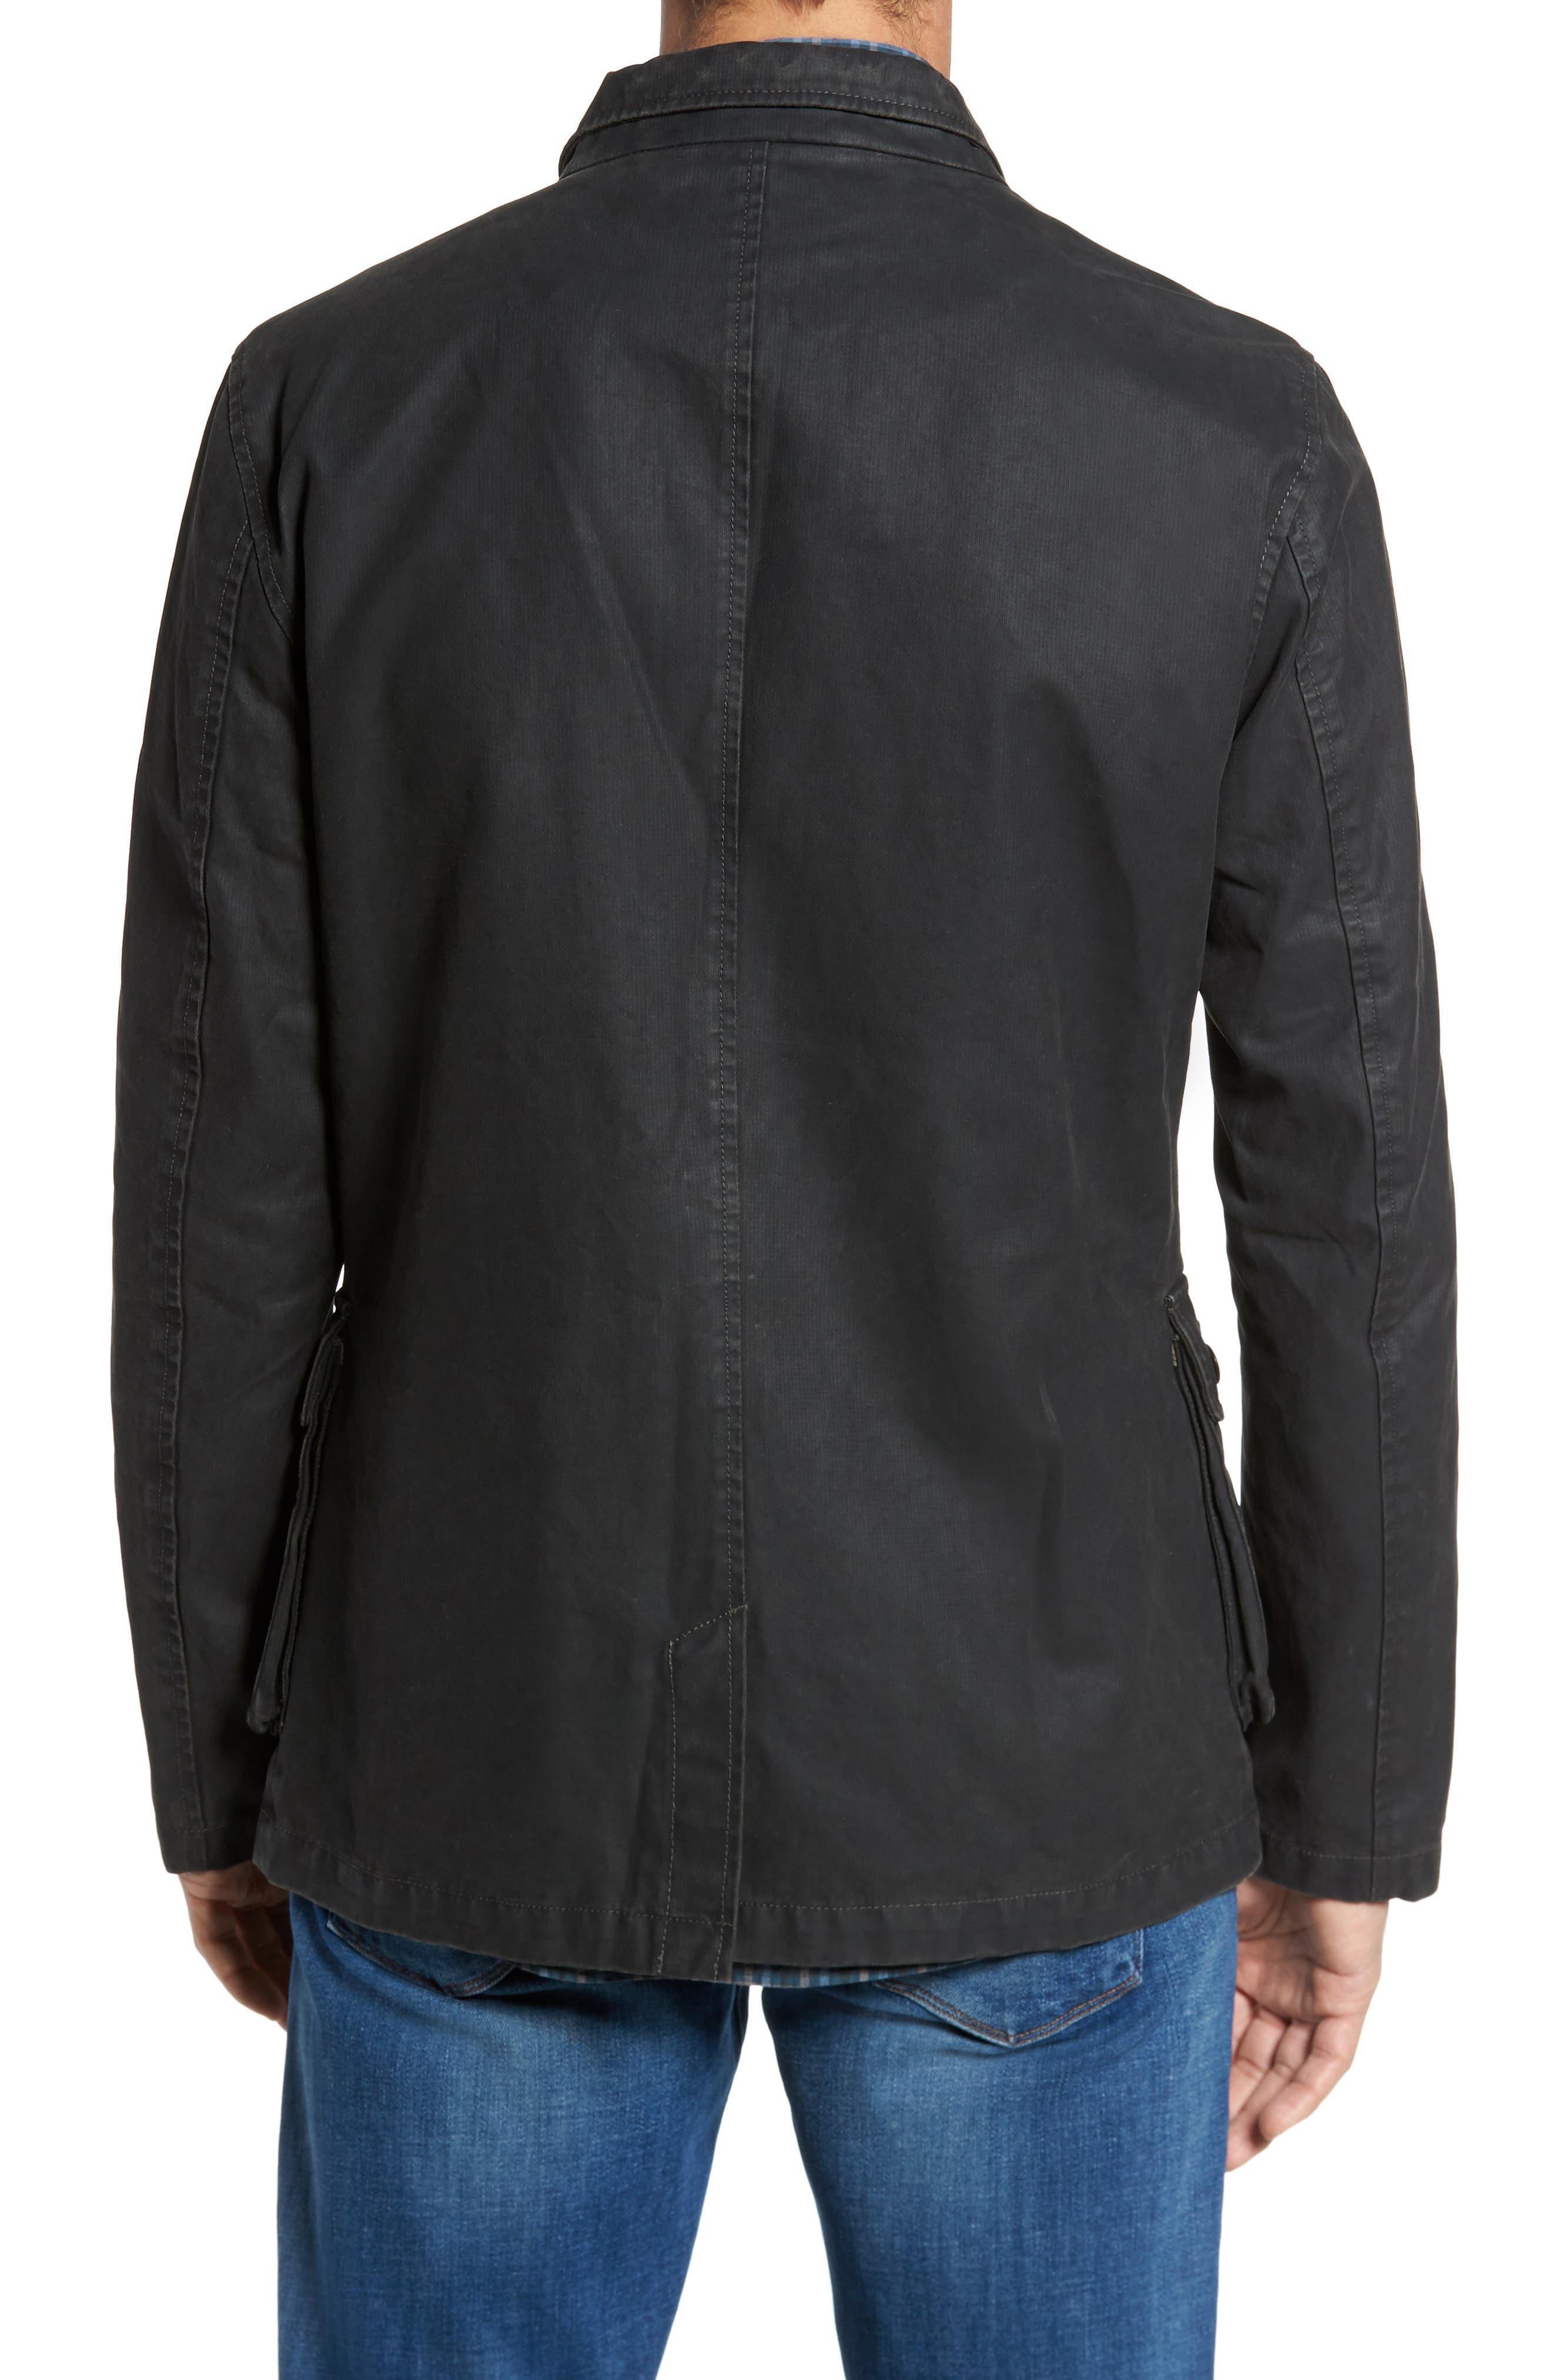 Blackmount Water-Resistant Jacket,                             Alternate thumbnail 2, color,                             302